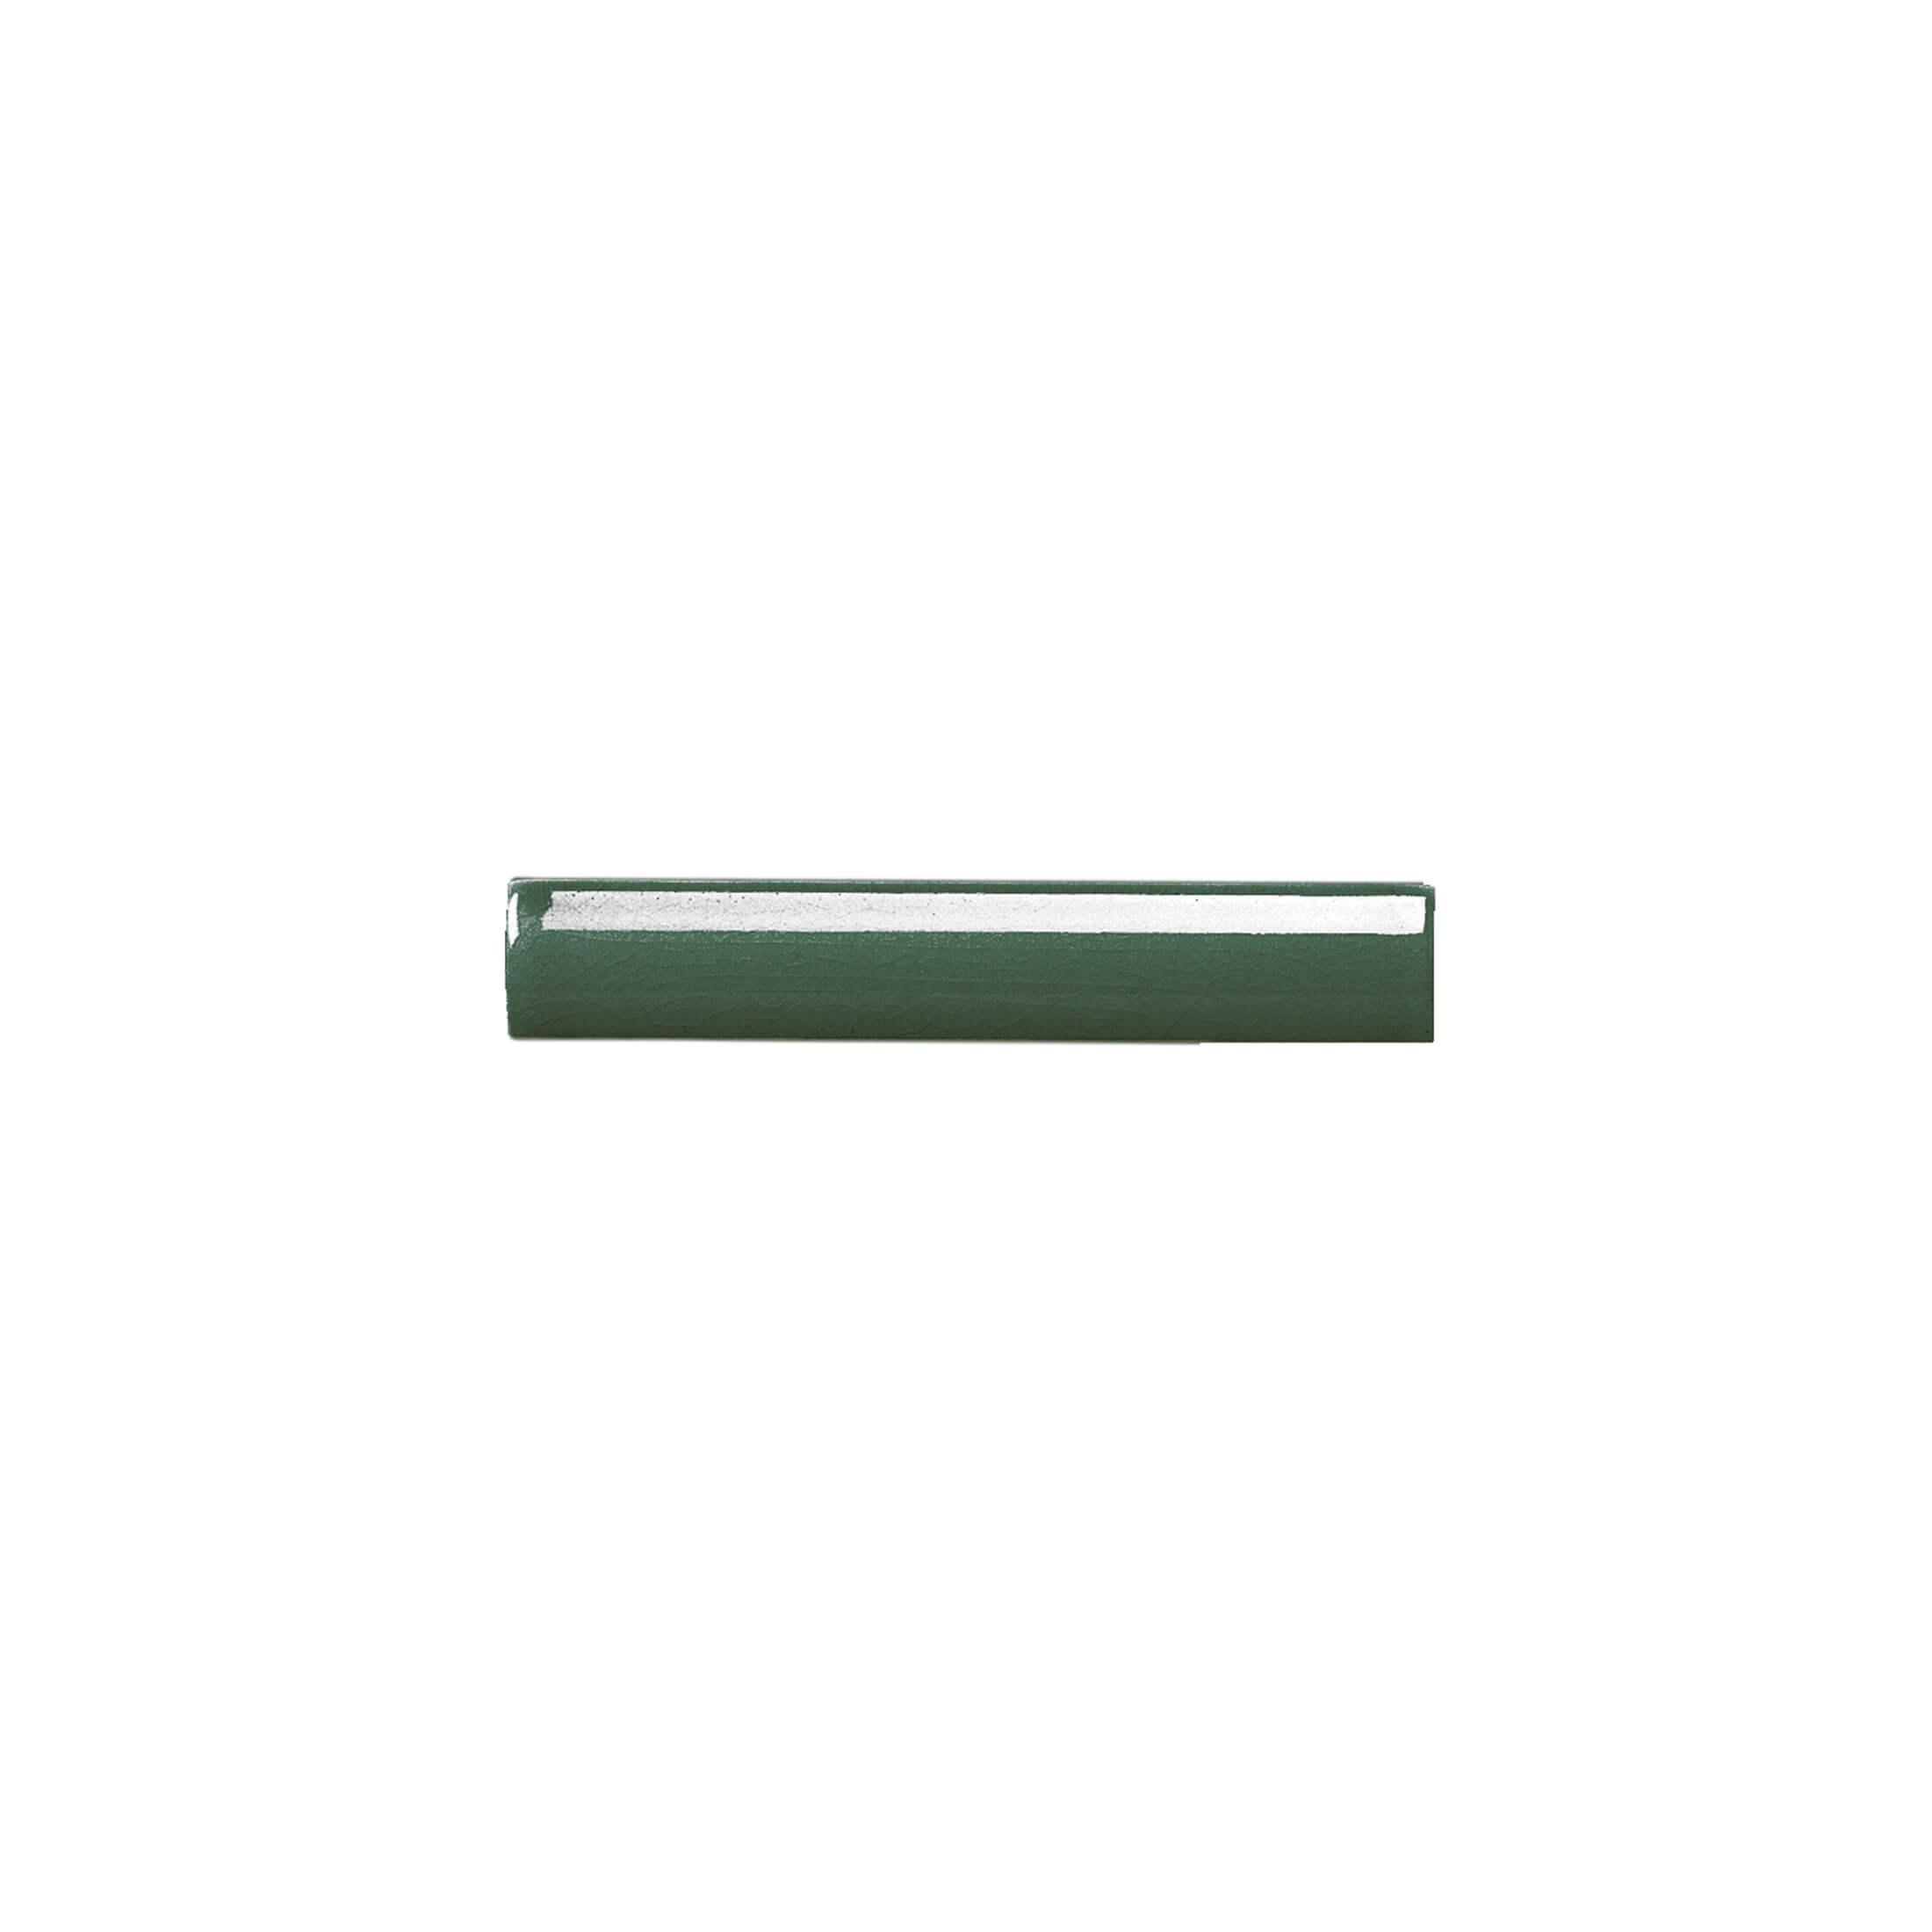 ADMO5181 - CUBRECANTO PB C/C - 2.5 cm X 15 cm